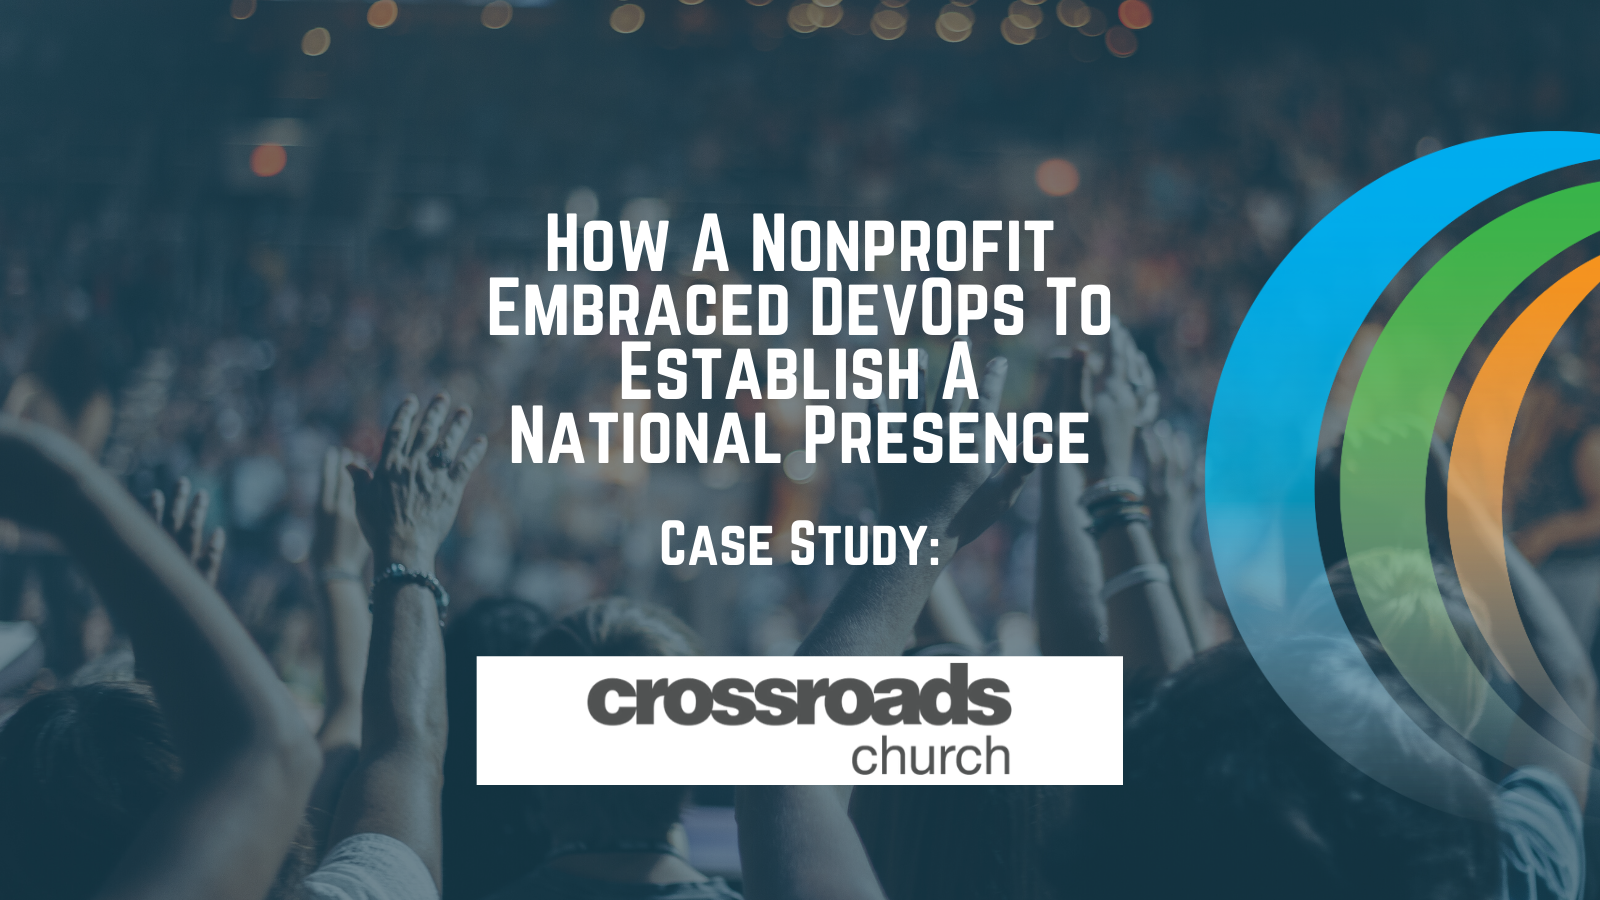 crossroads-case-study